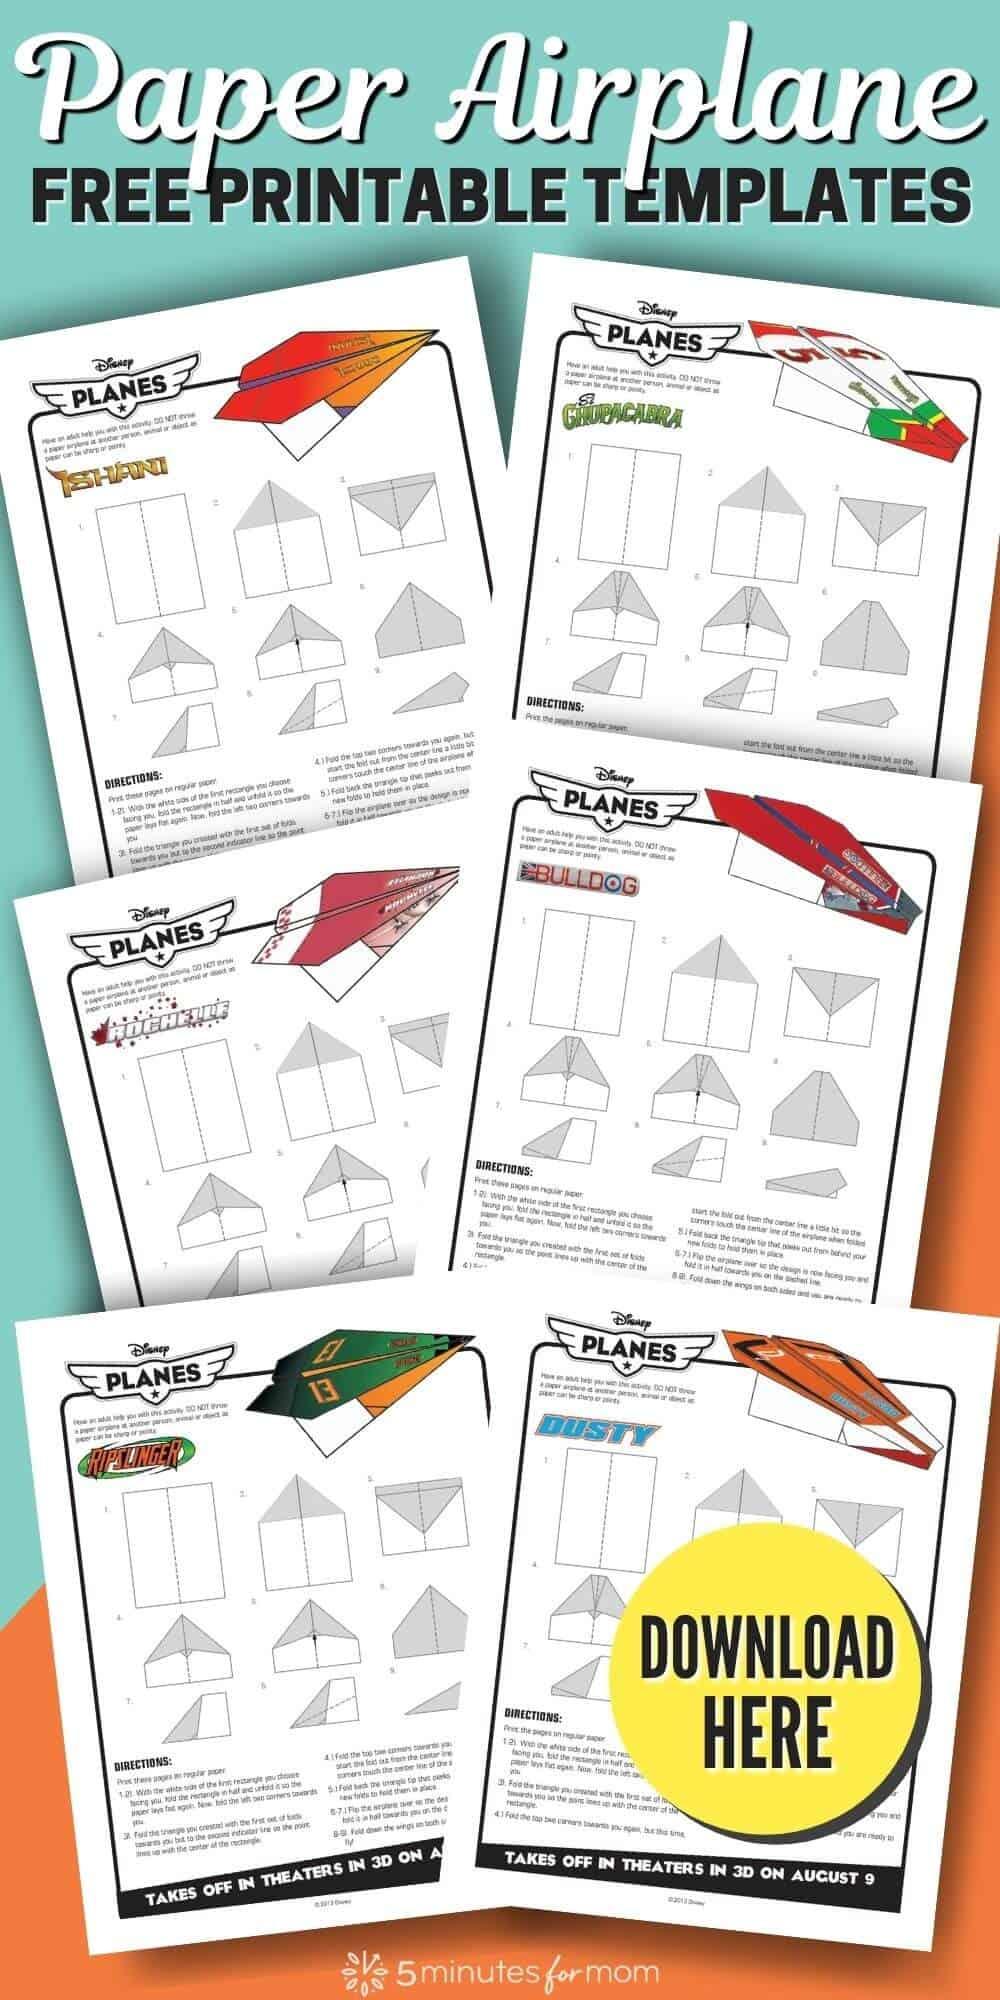 Paper Airplane Free Printable Templates - Disney Planes